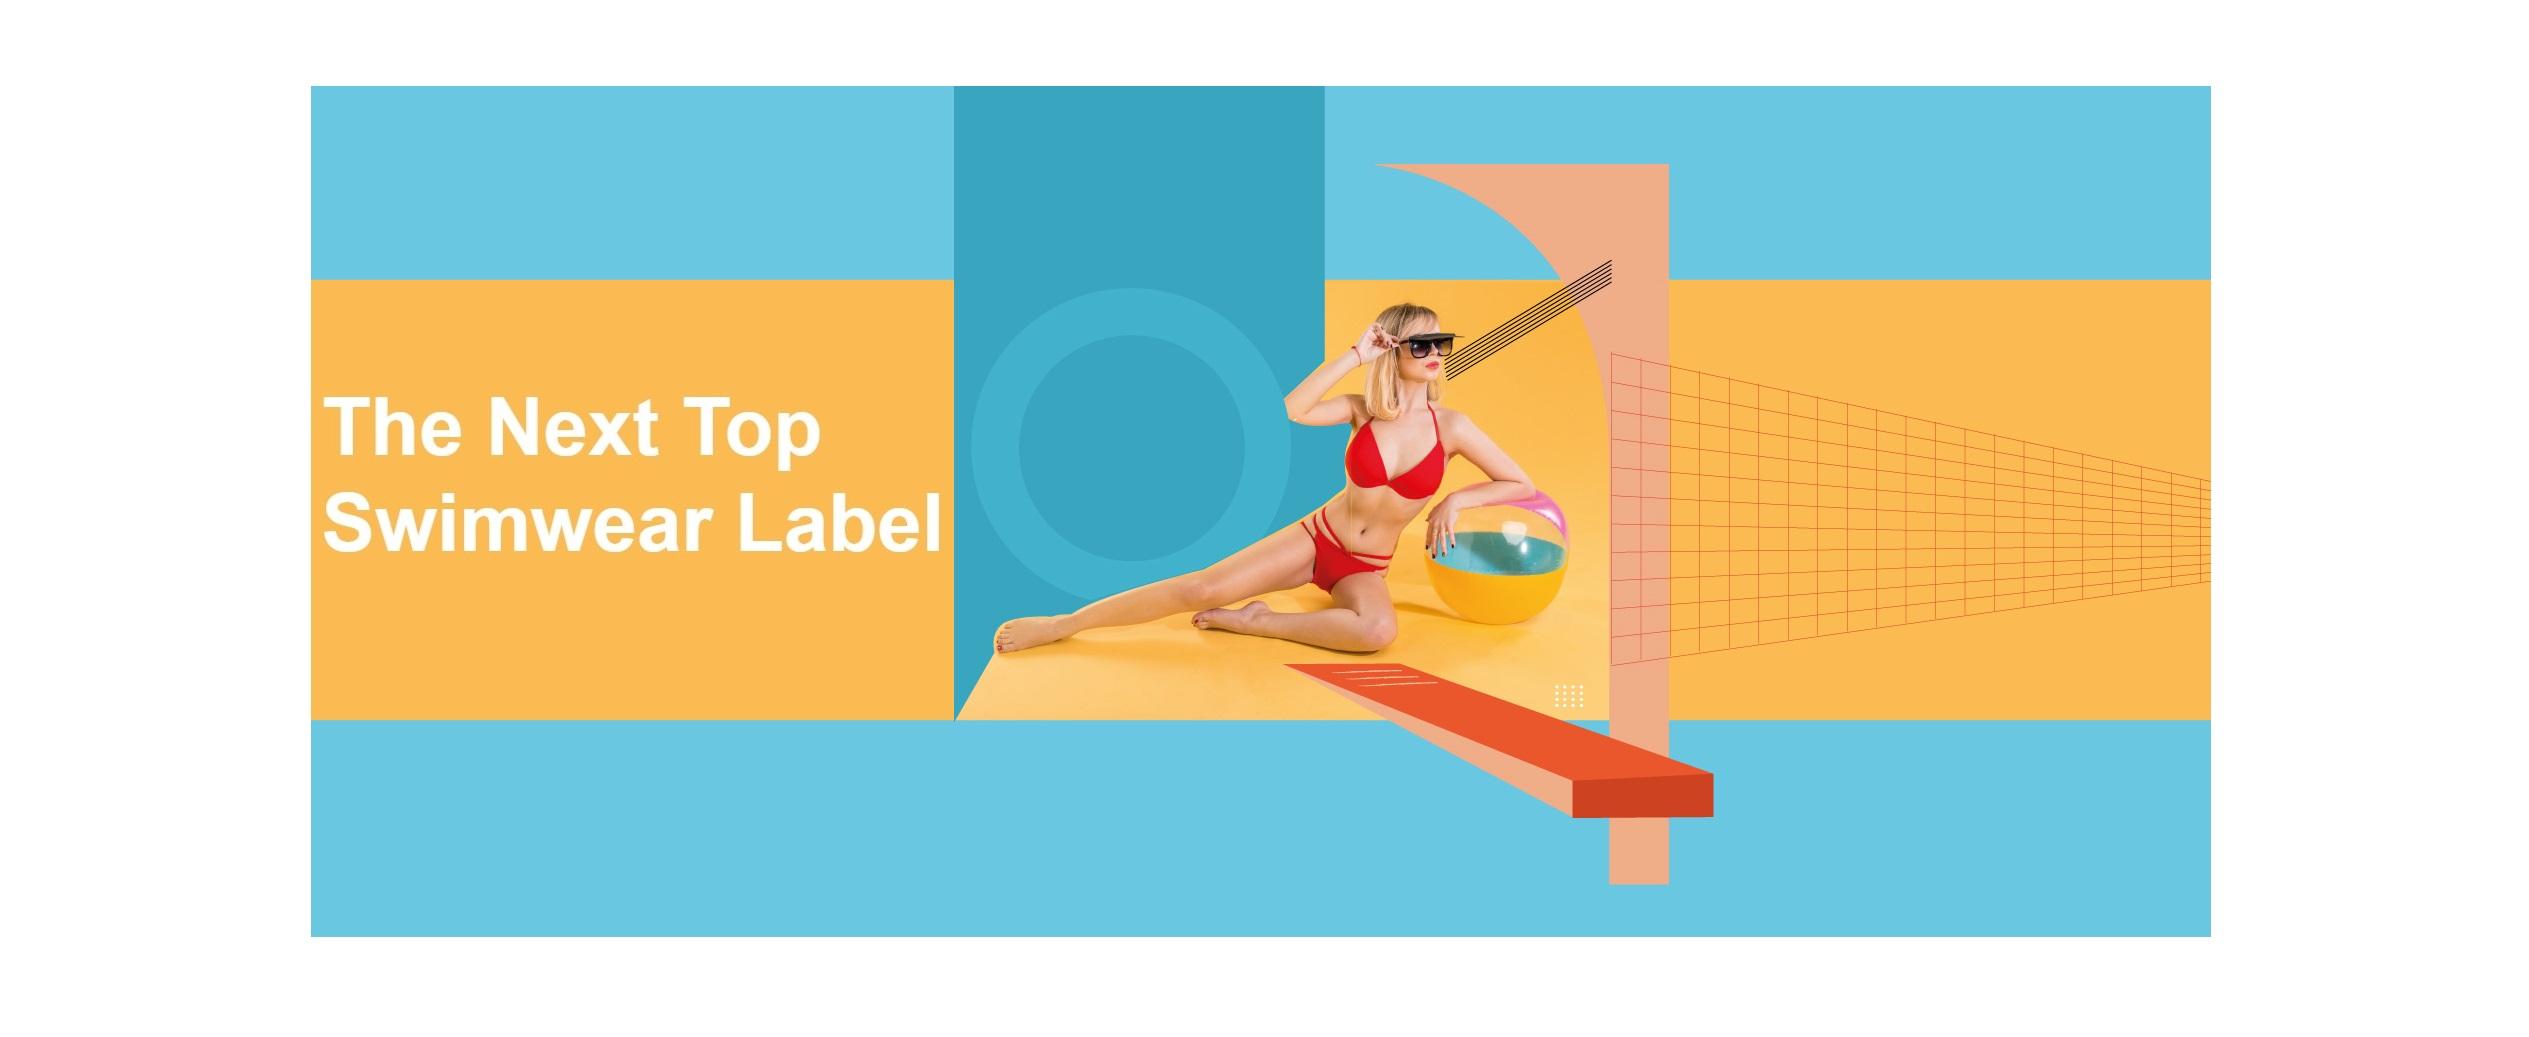 SwimKit Blog-Banner-Design-1900-x-850-px-BLOG-new-02